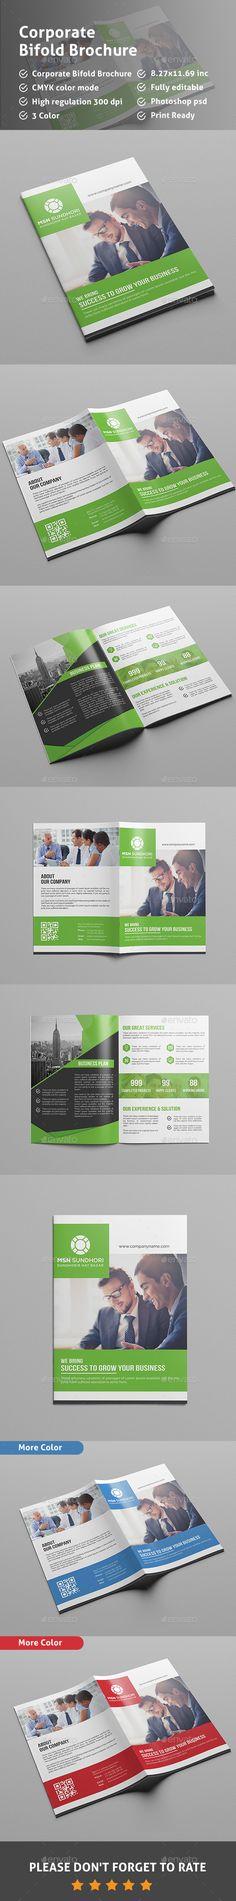 Bi Fold Brochure Template Corporate Brochure Template by Pixelpick.